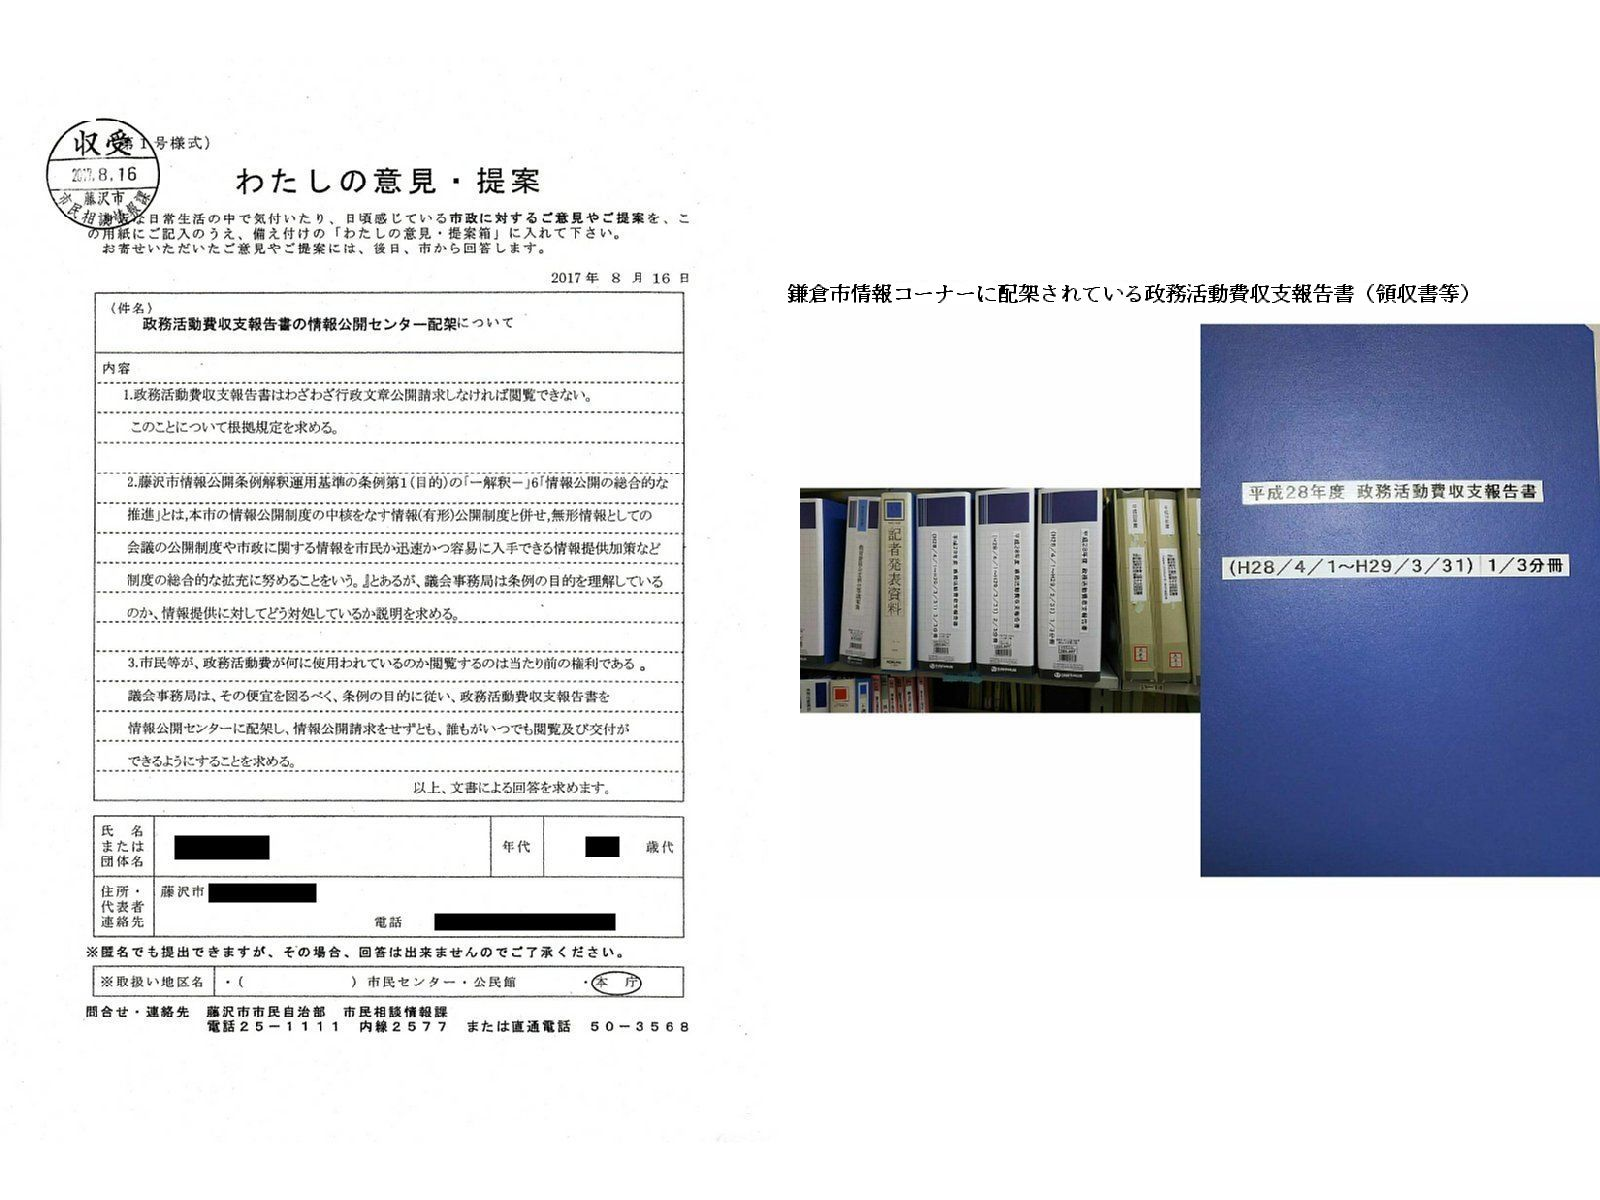 http://fujikama.coolblog.jp/2017/20170817.jpg